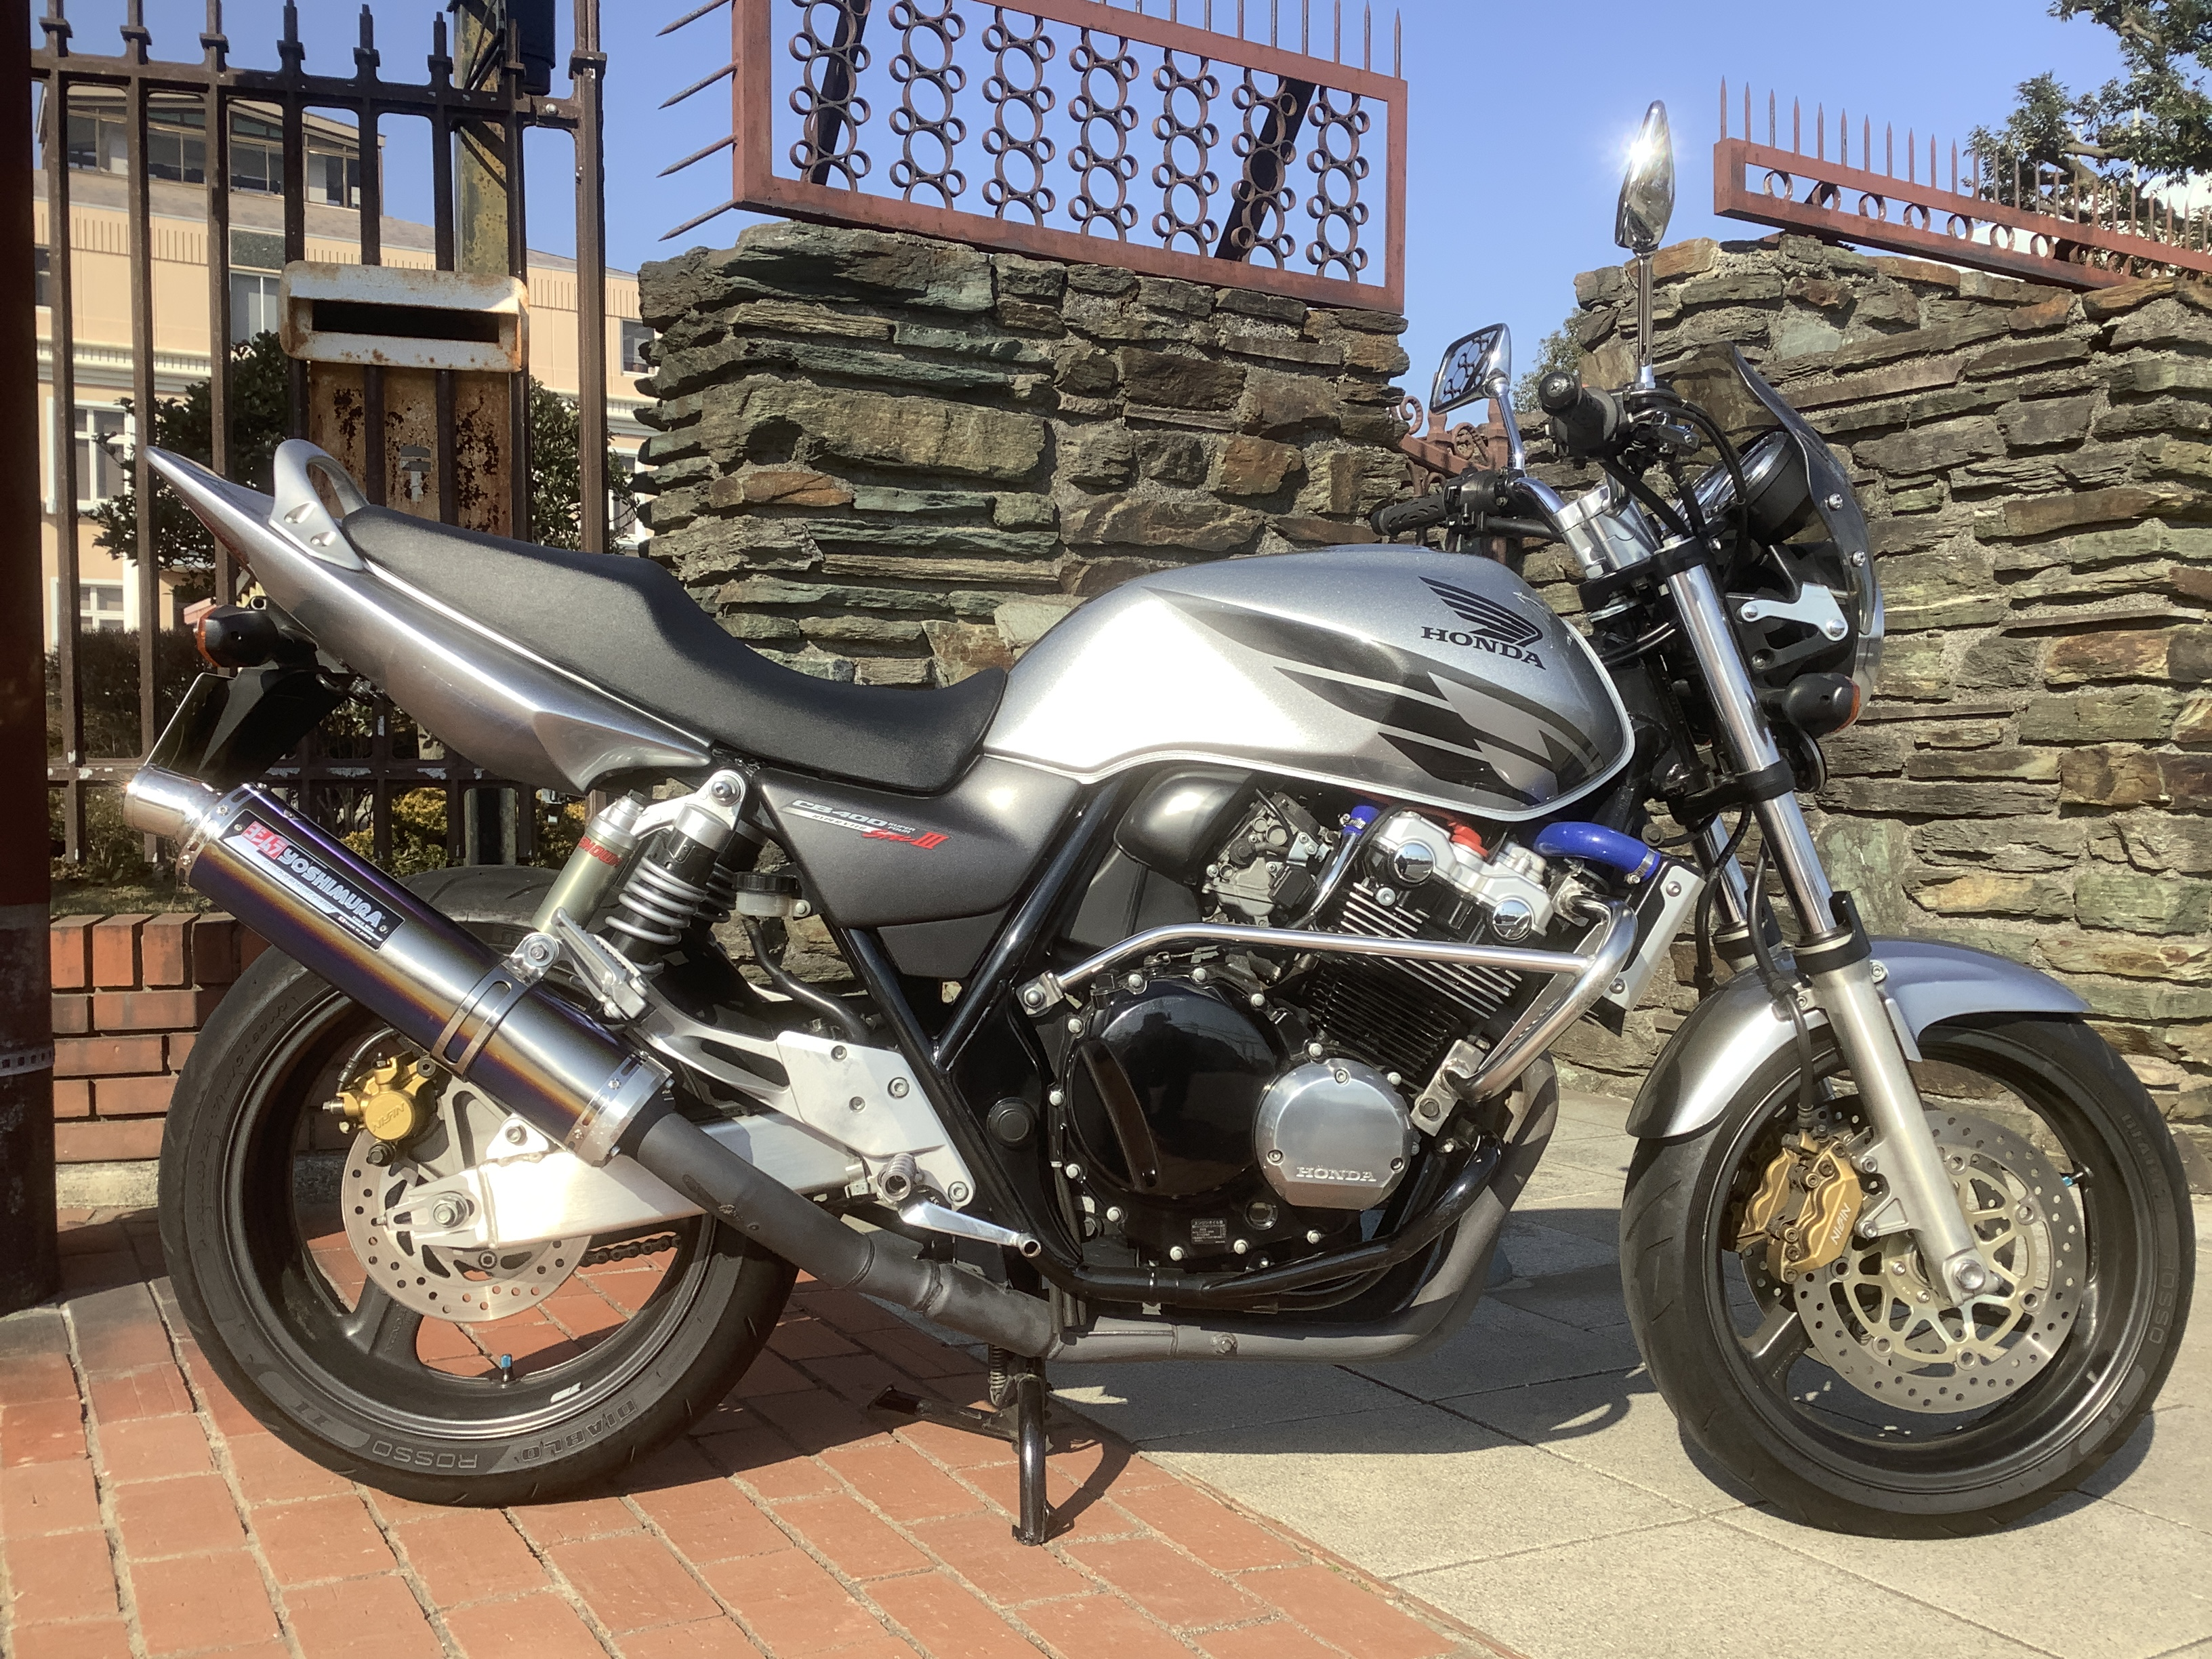 CB400Vtec-3(HN-00)銀 - 【公式】レンタルバイクのベストBike® 用賀駅前